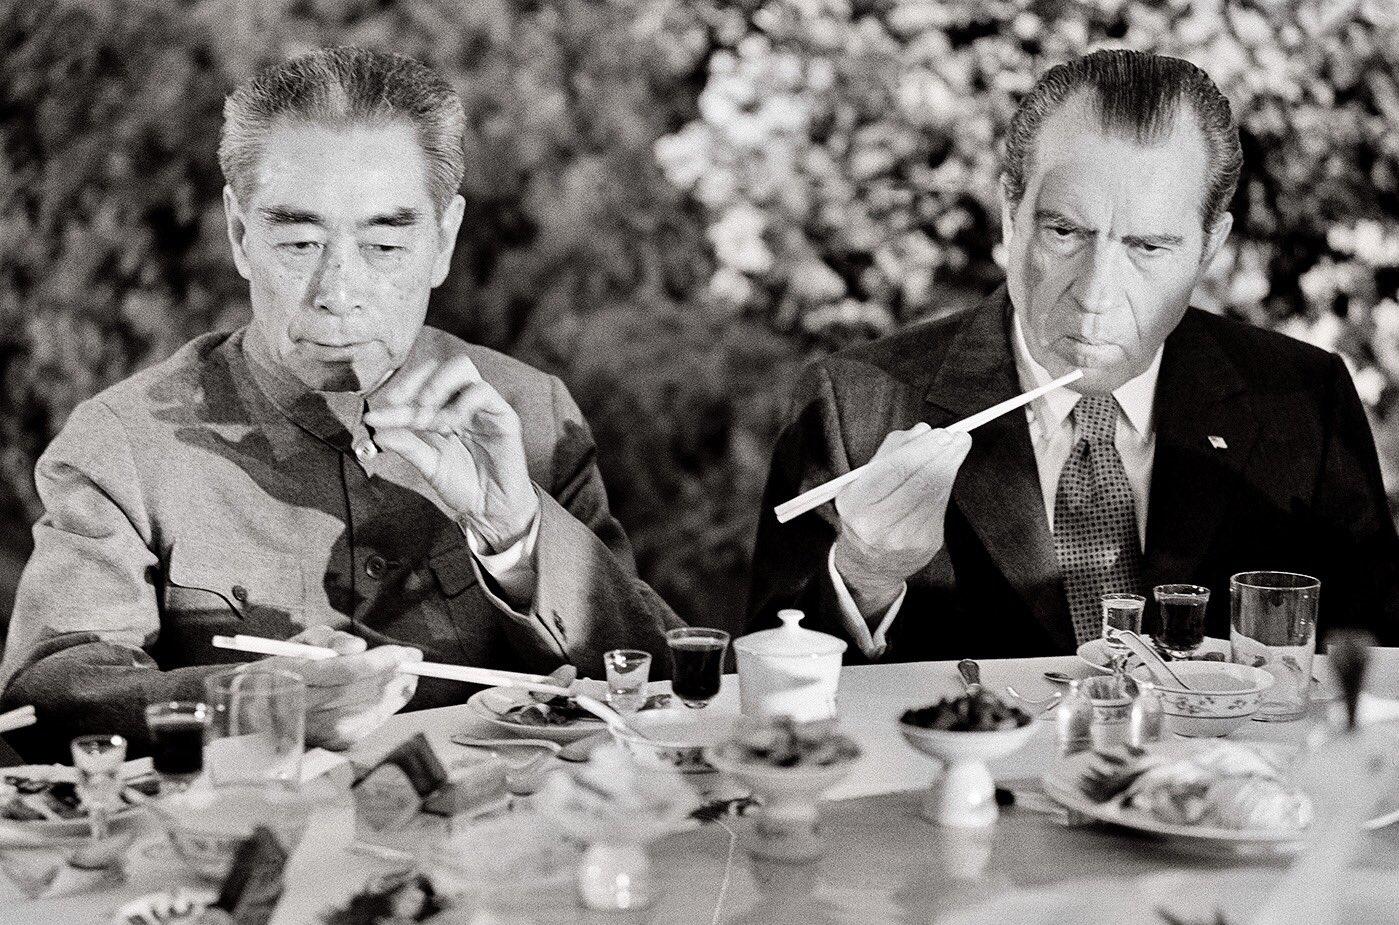 an analysis of president nixons visit to china in 1972